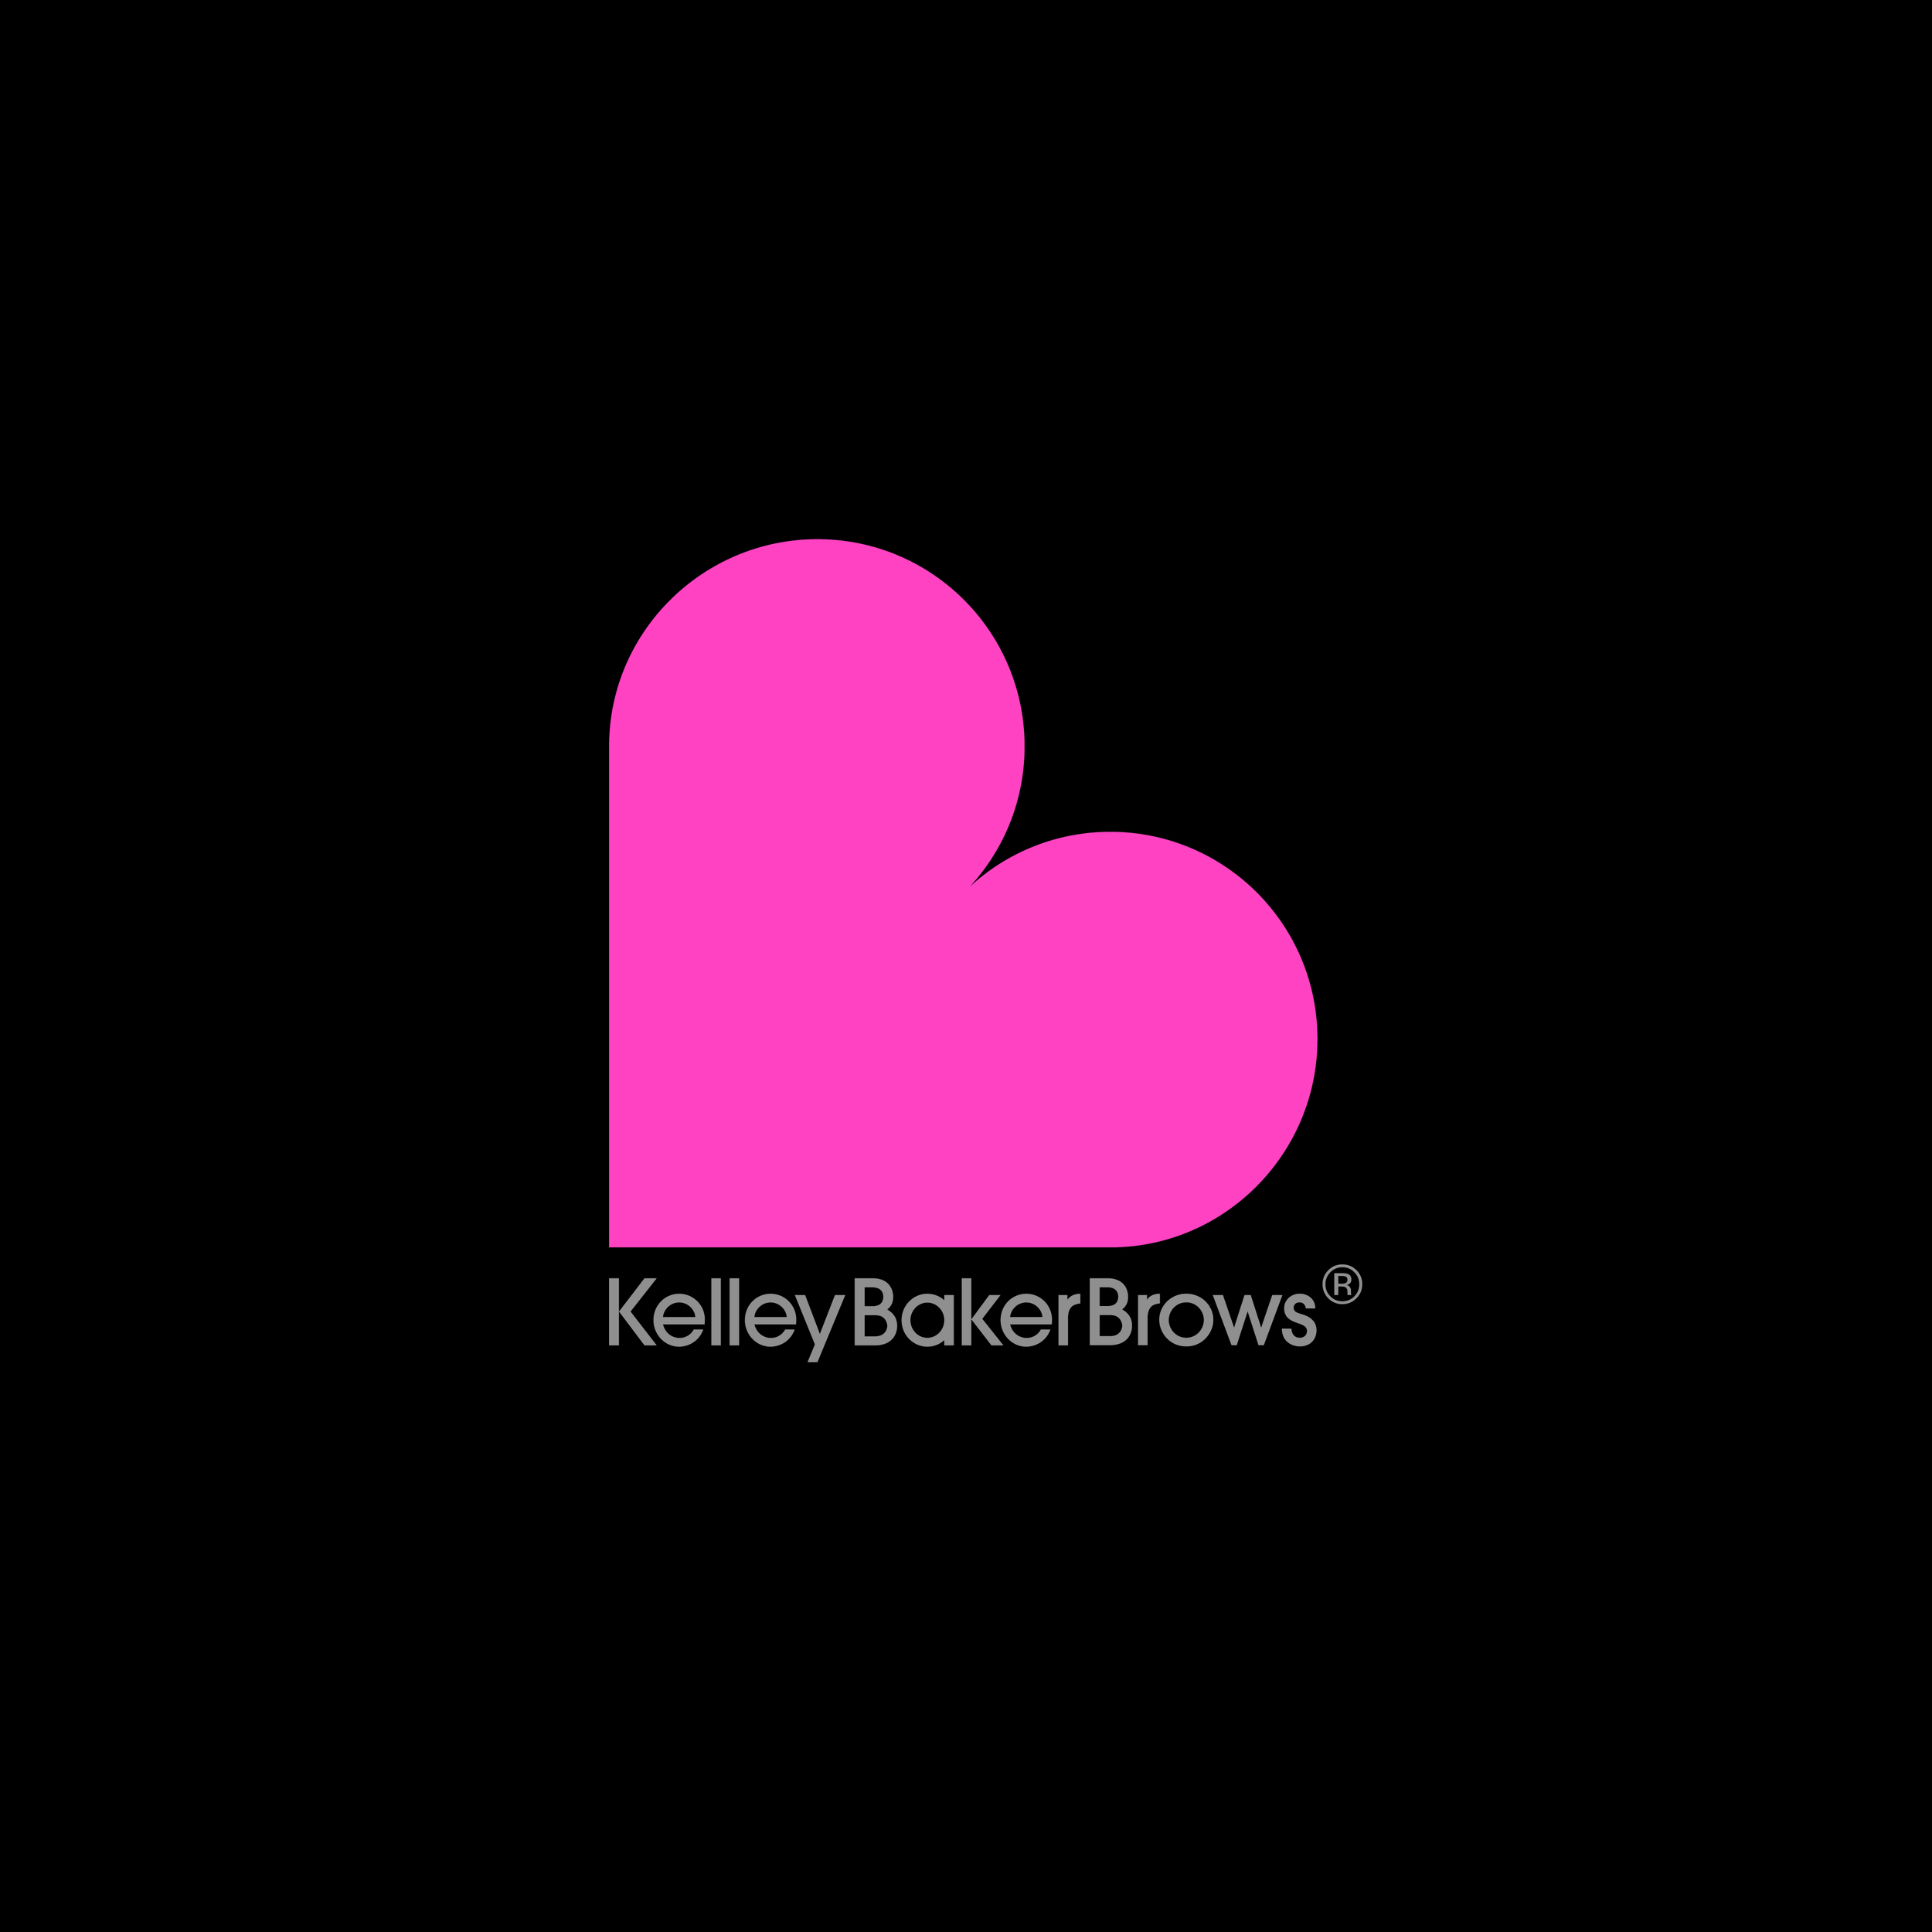 Kelley-Baker-Brows_Logo_Justin-Harder